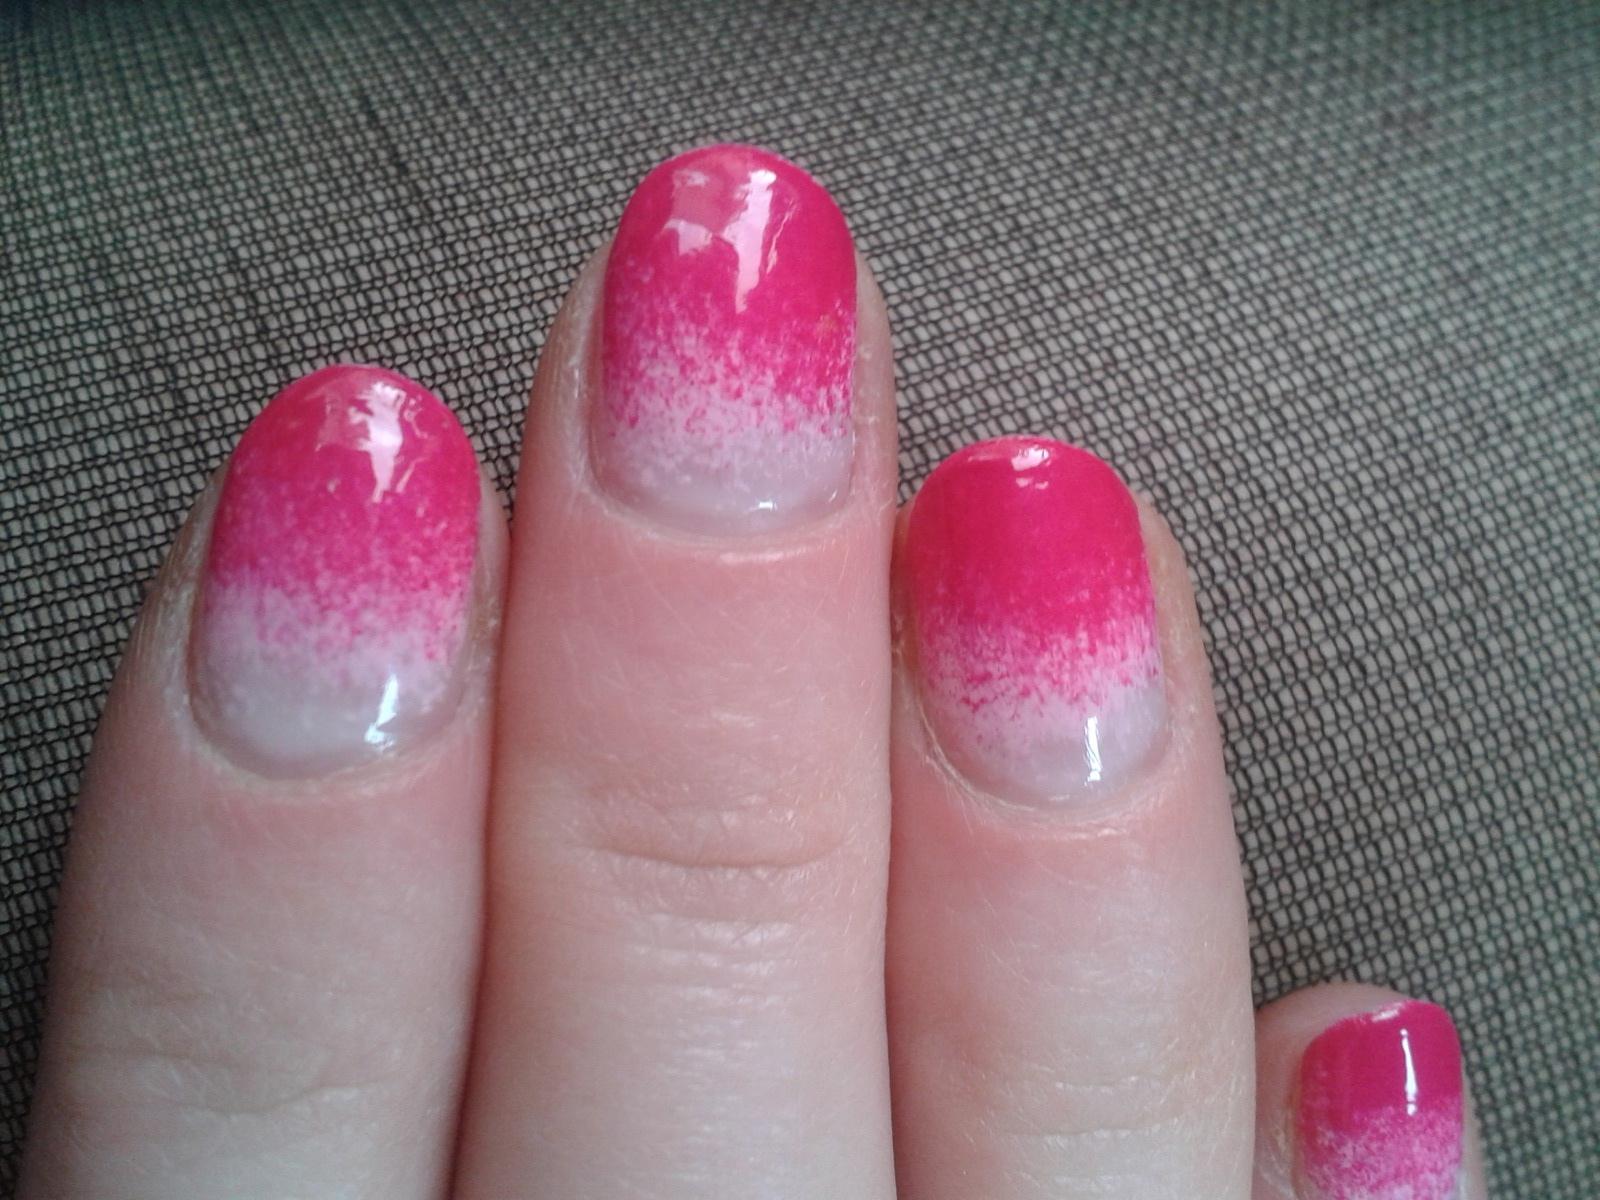 http://1.bp.blogspot.com/-EzHF4naEaFU/T56jc4UkwOI/AAAAAAAAAhk/VWRZHFjx9hk/s1600/nails+2.jpg